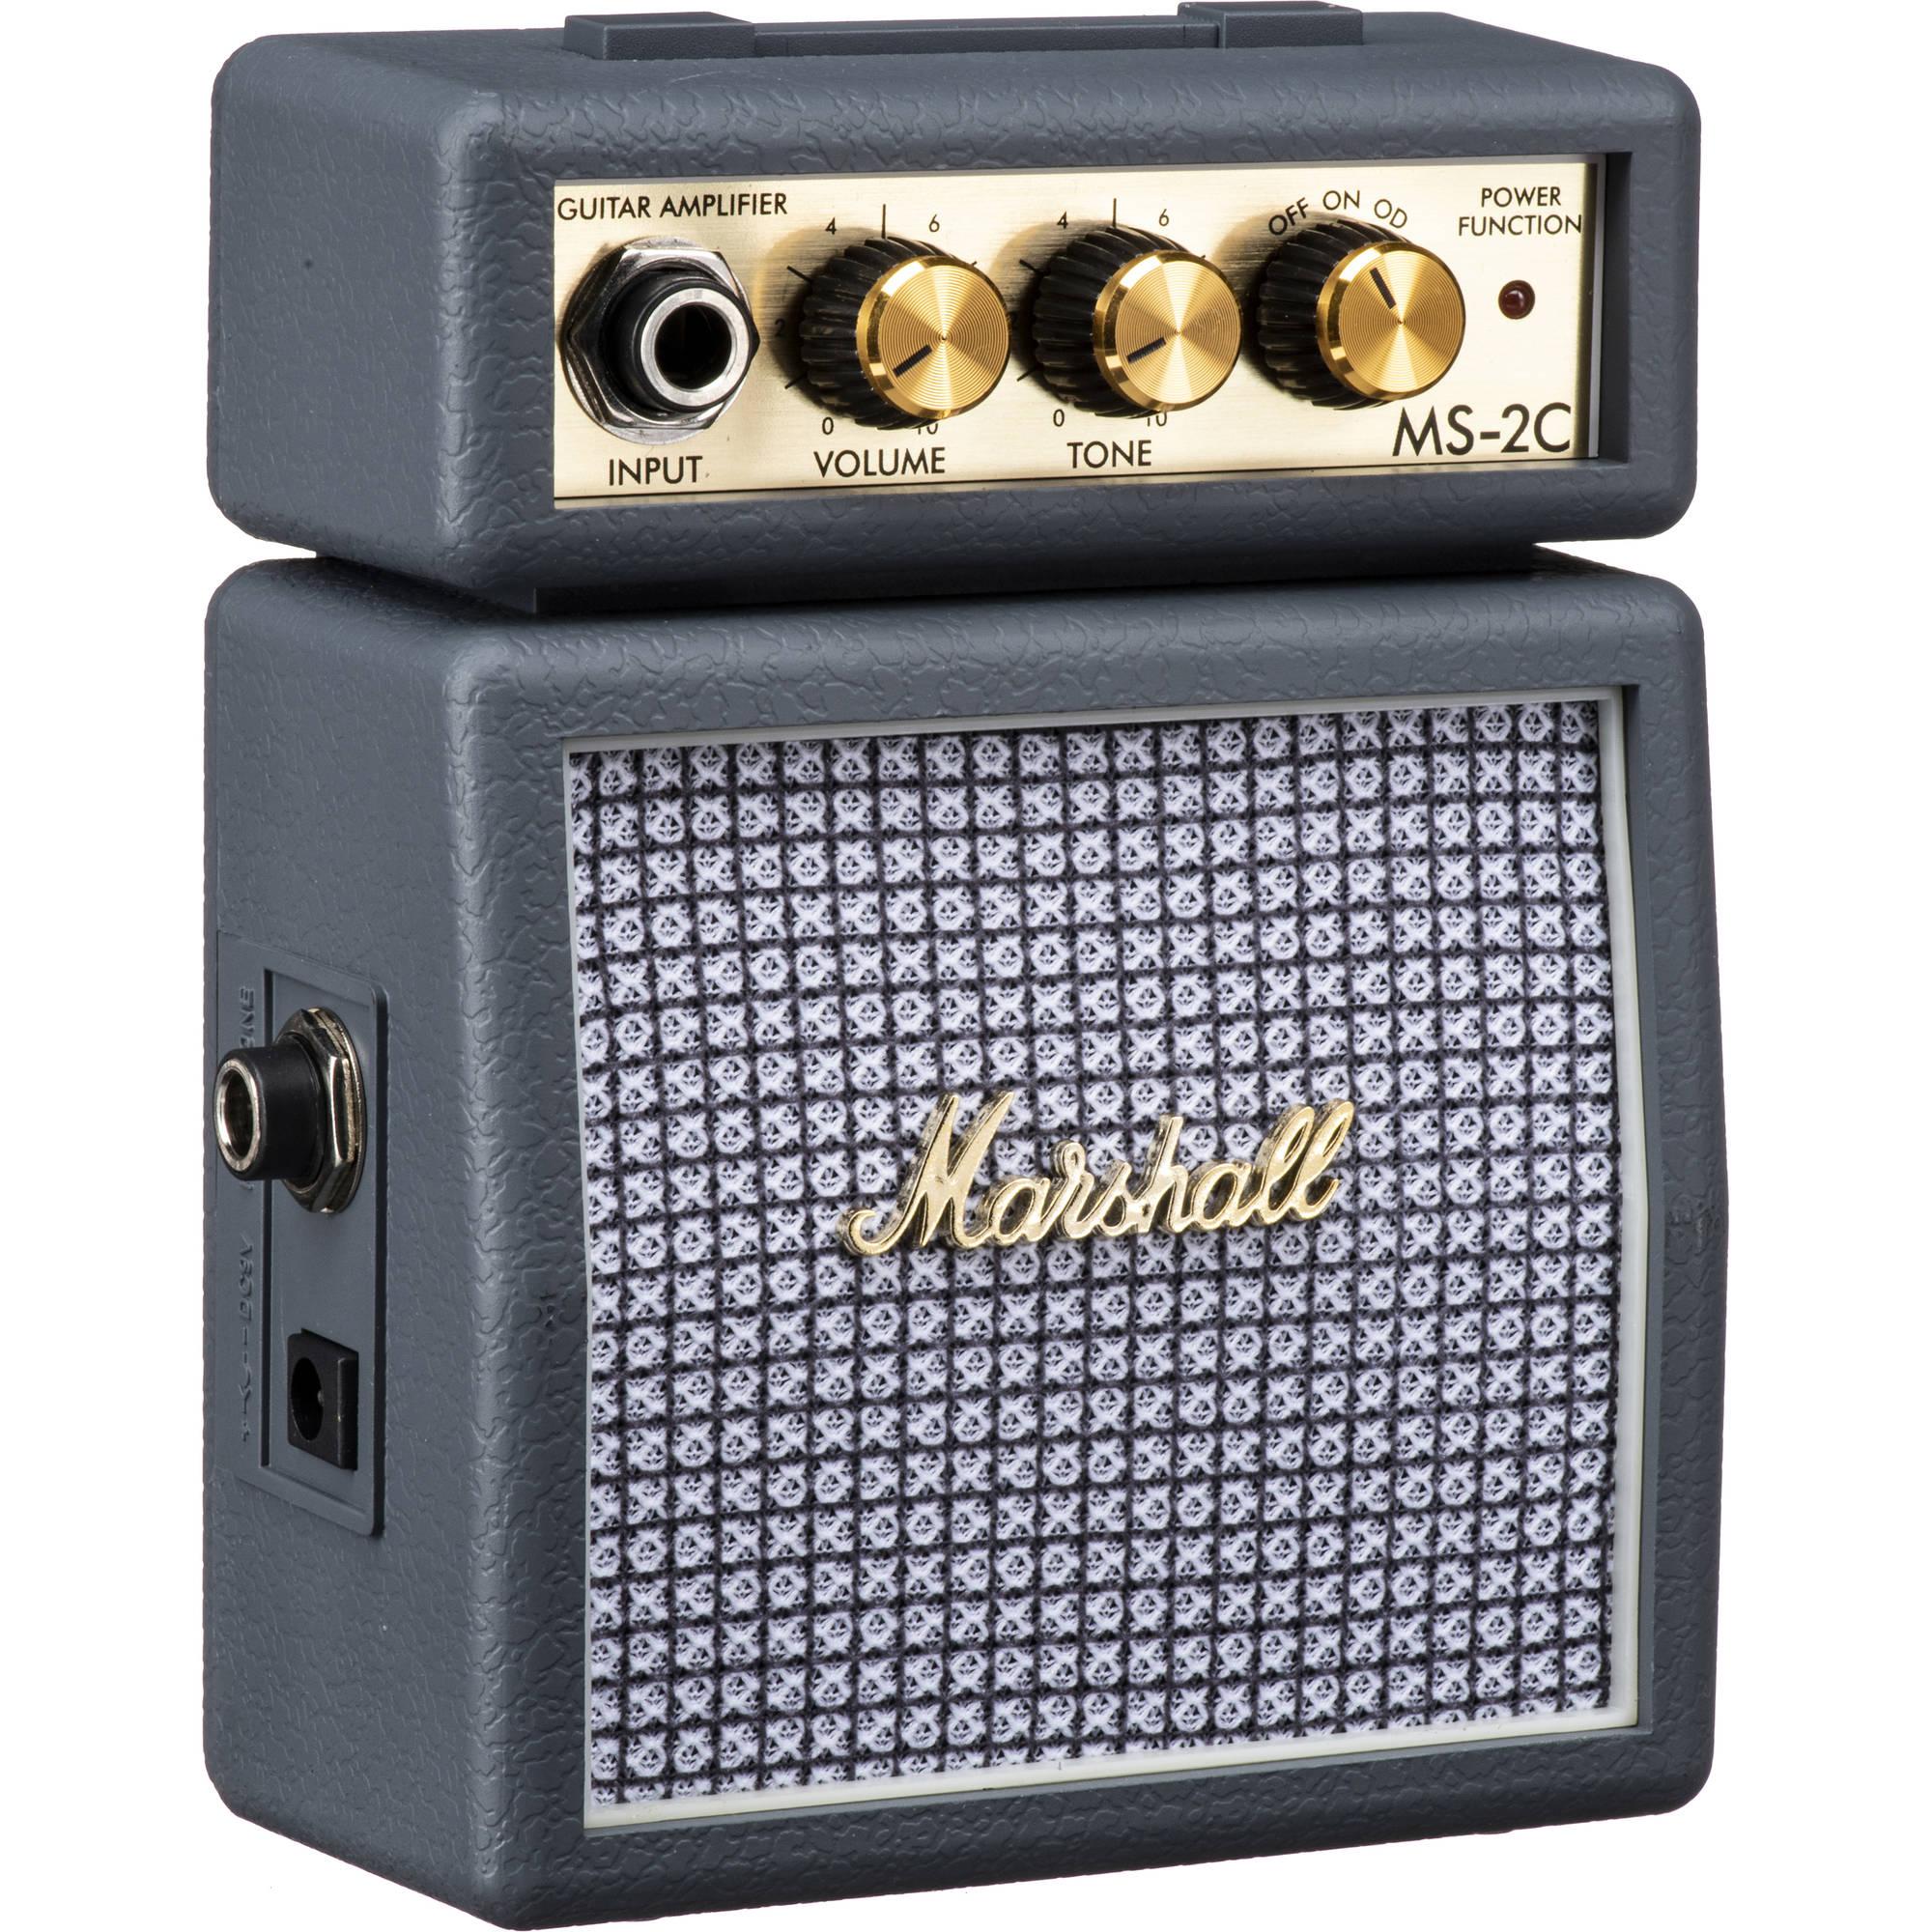 marshall amplification ms 2c micro amp mini practice amp ms 2c rh bhphotovideo com Micro Audio Amplifier Cards DC Audio Micro Amplifiers